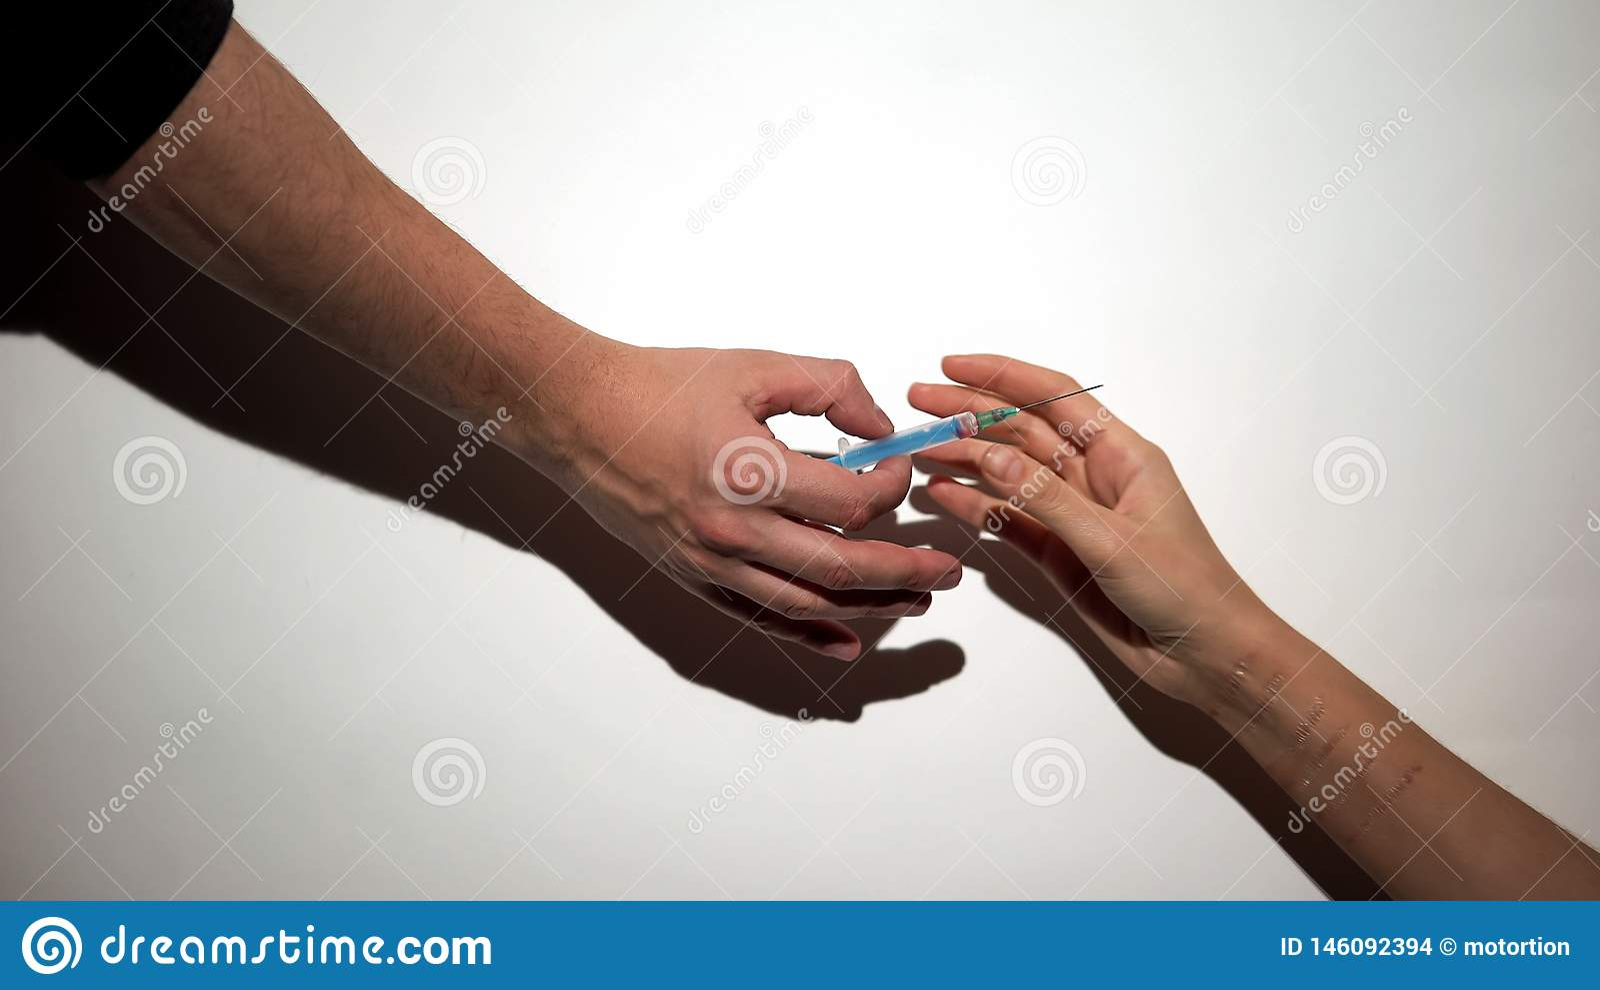 Drug dealer hand giving self-inflicted addict syringe with dose, mental disease